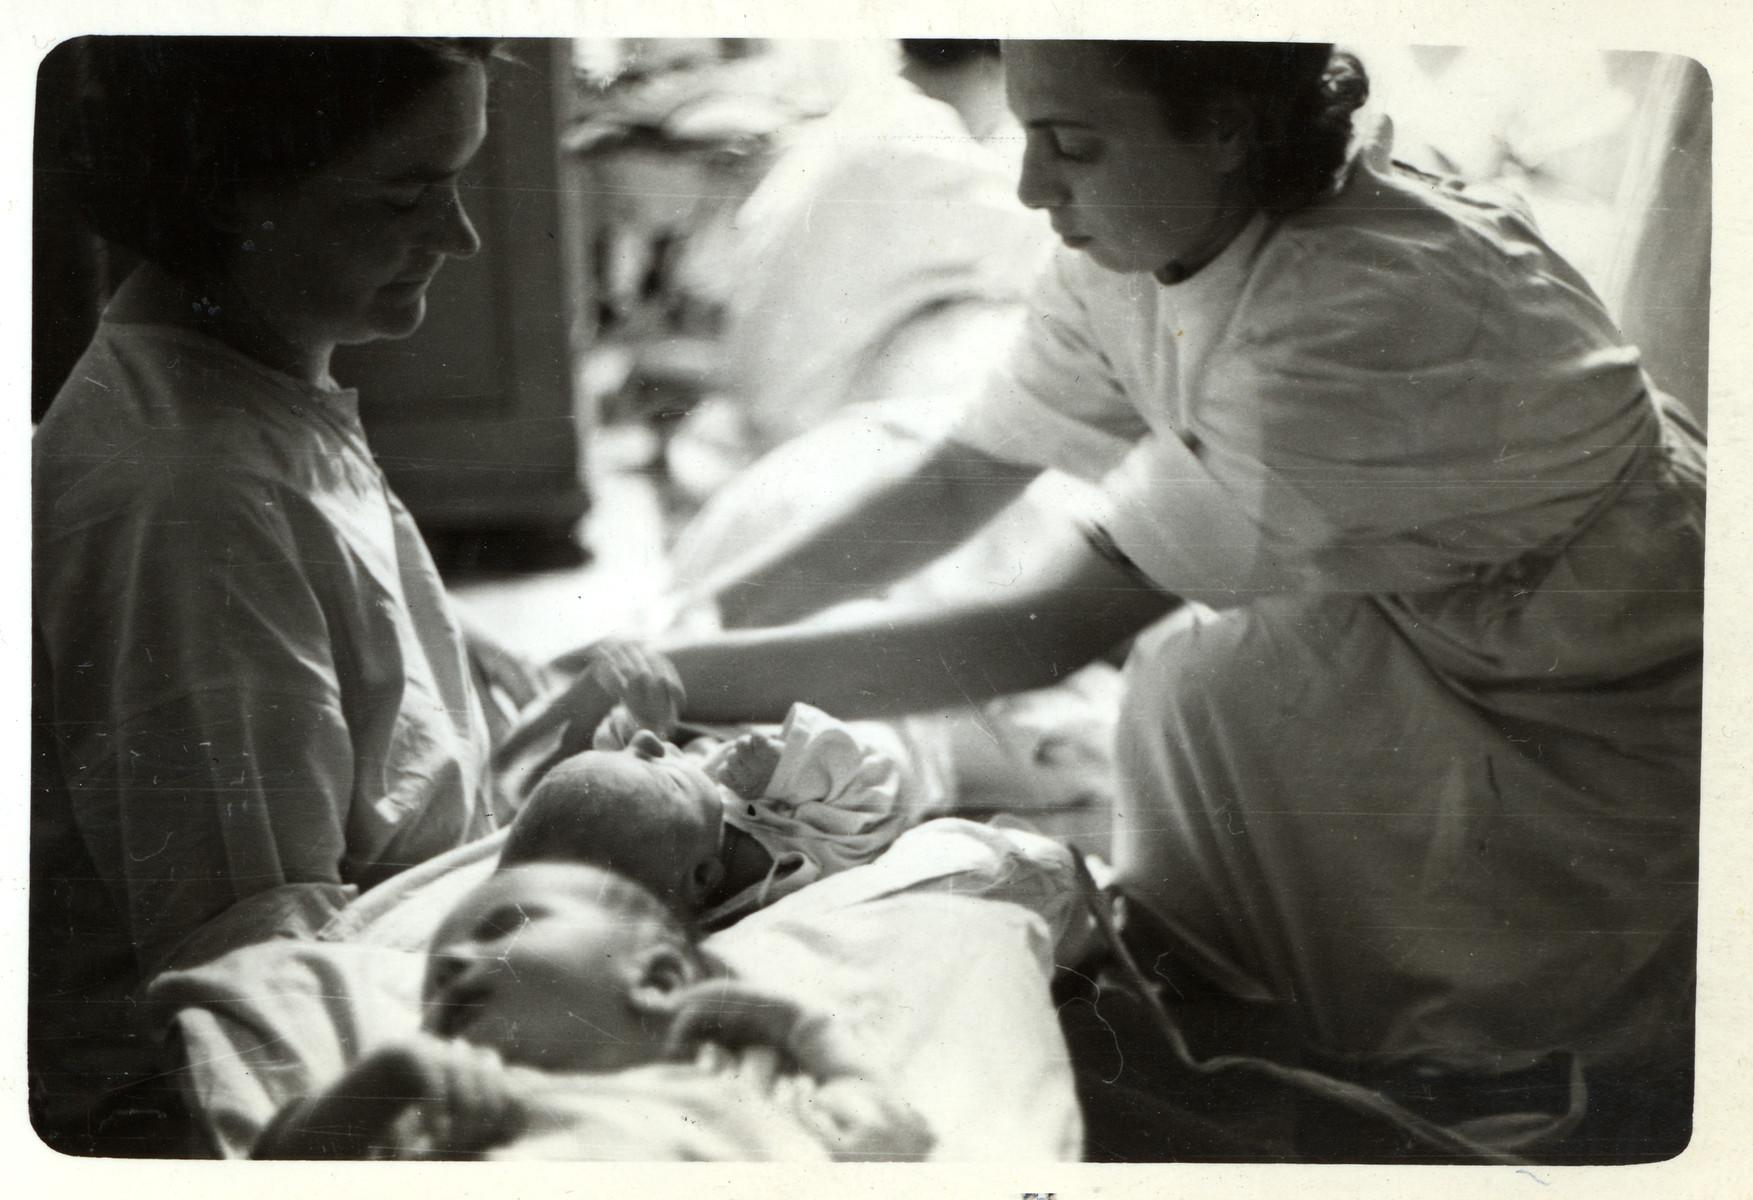 Nurses tend to newborn babies in a makeshift maternity ward in besieged Warsaw.